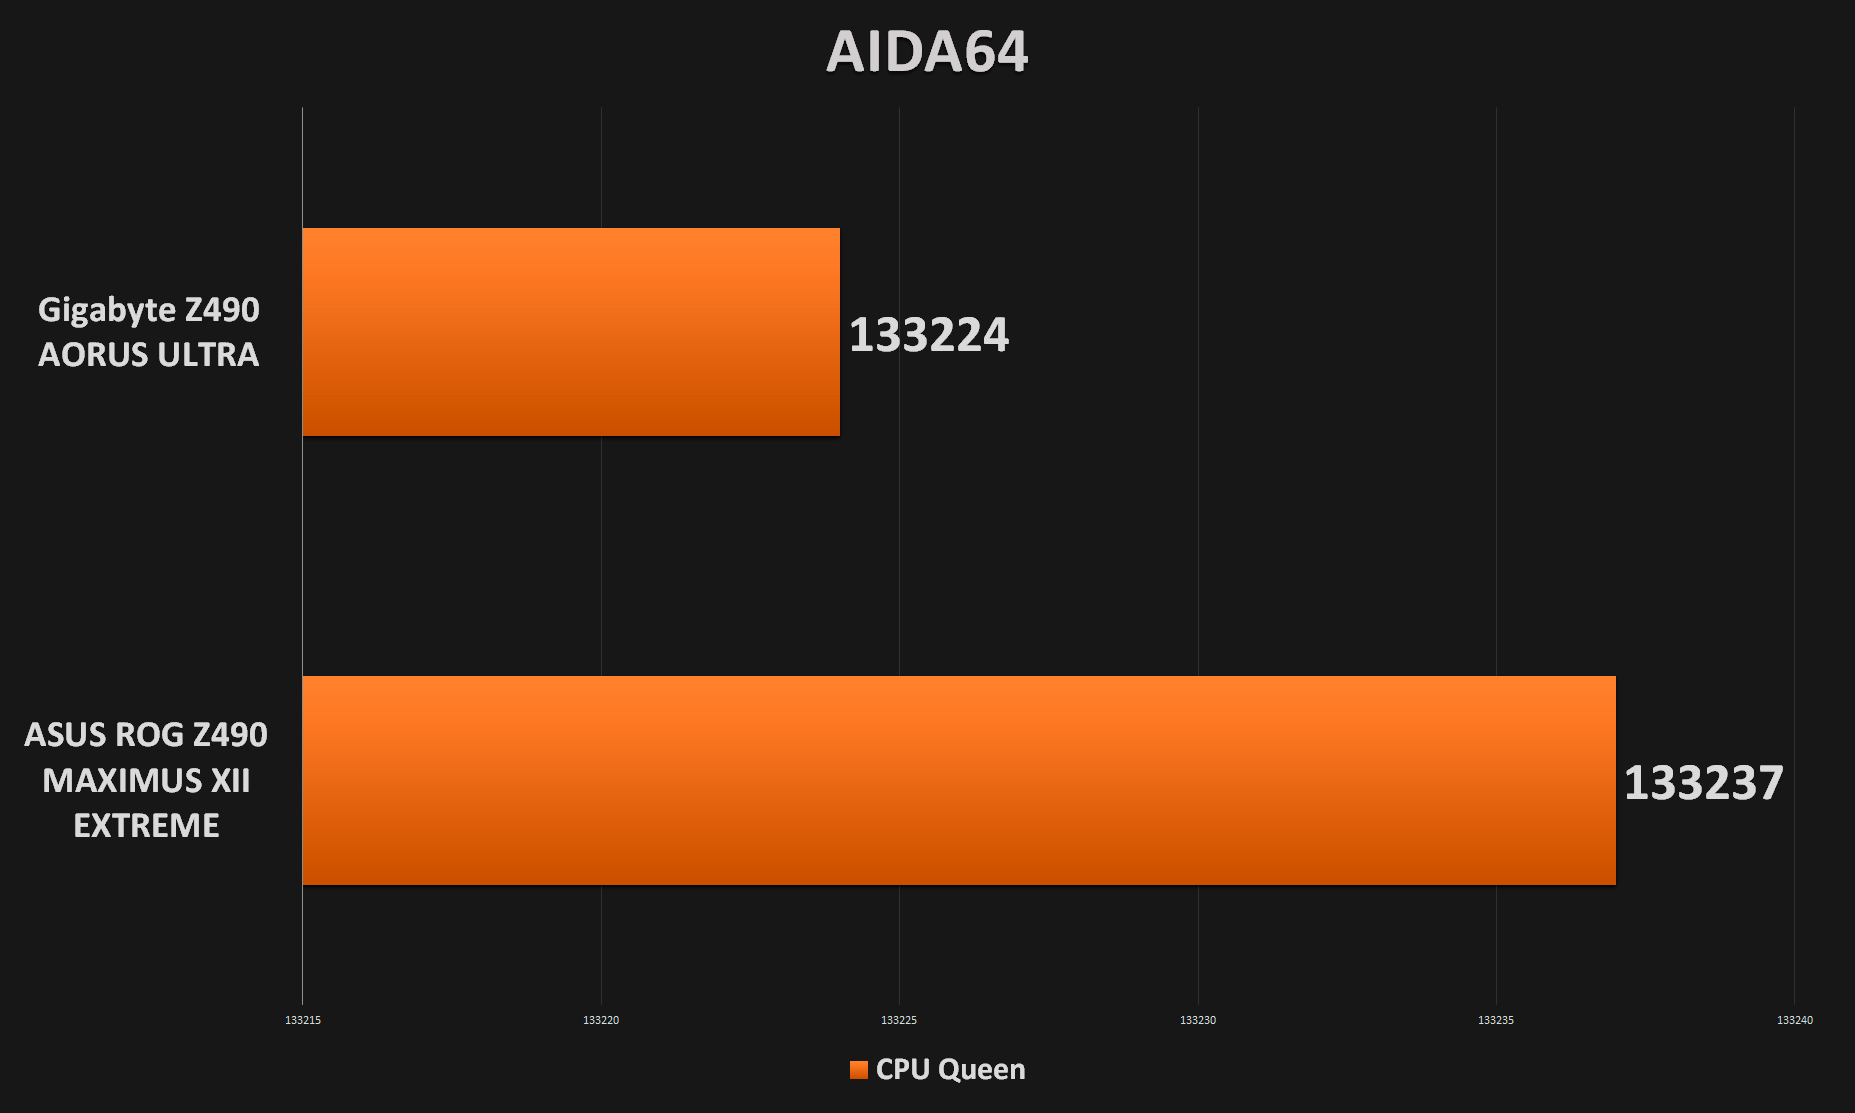 AIDA64 Results